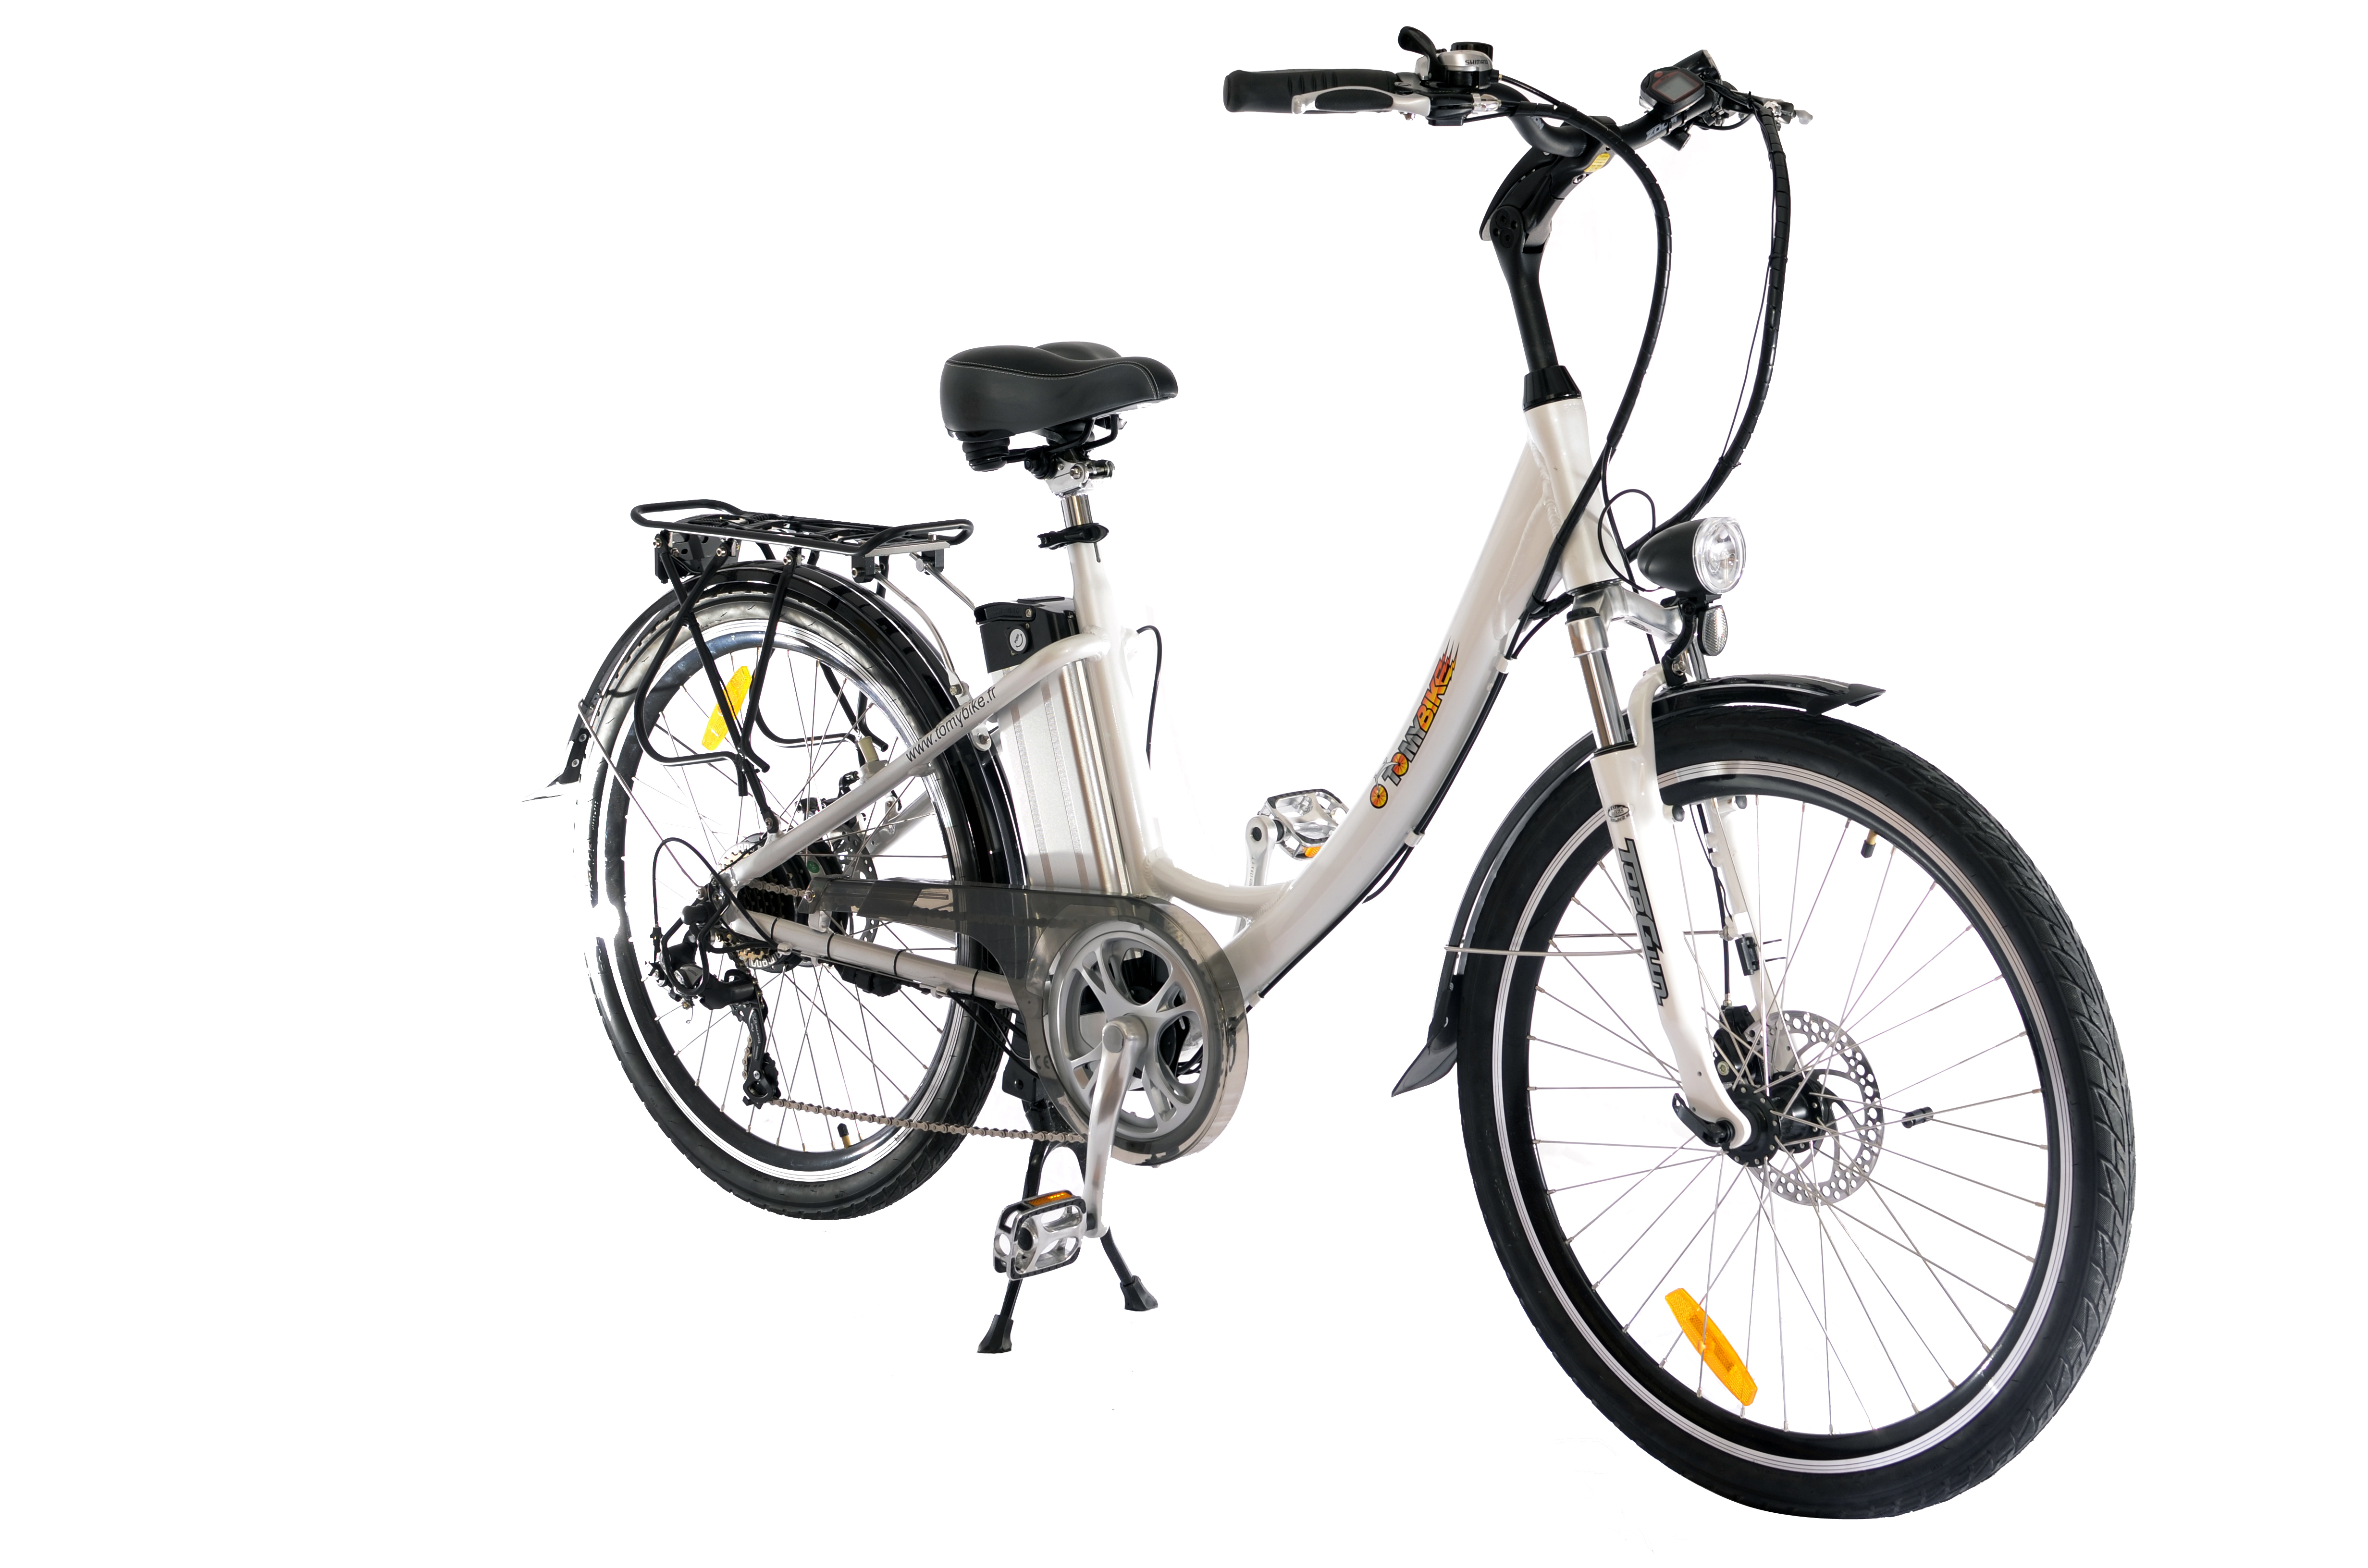 Rétro utile anneau en métal vélo Bike vélo guidon Bell alarme Sound Jf